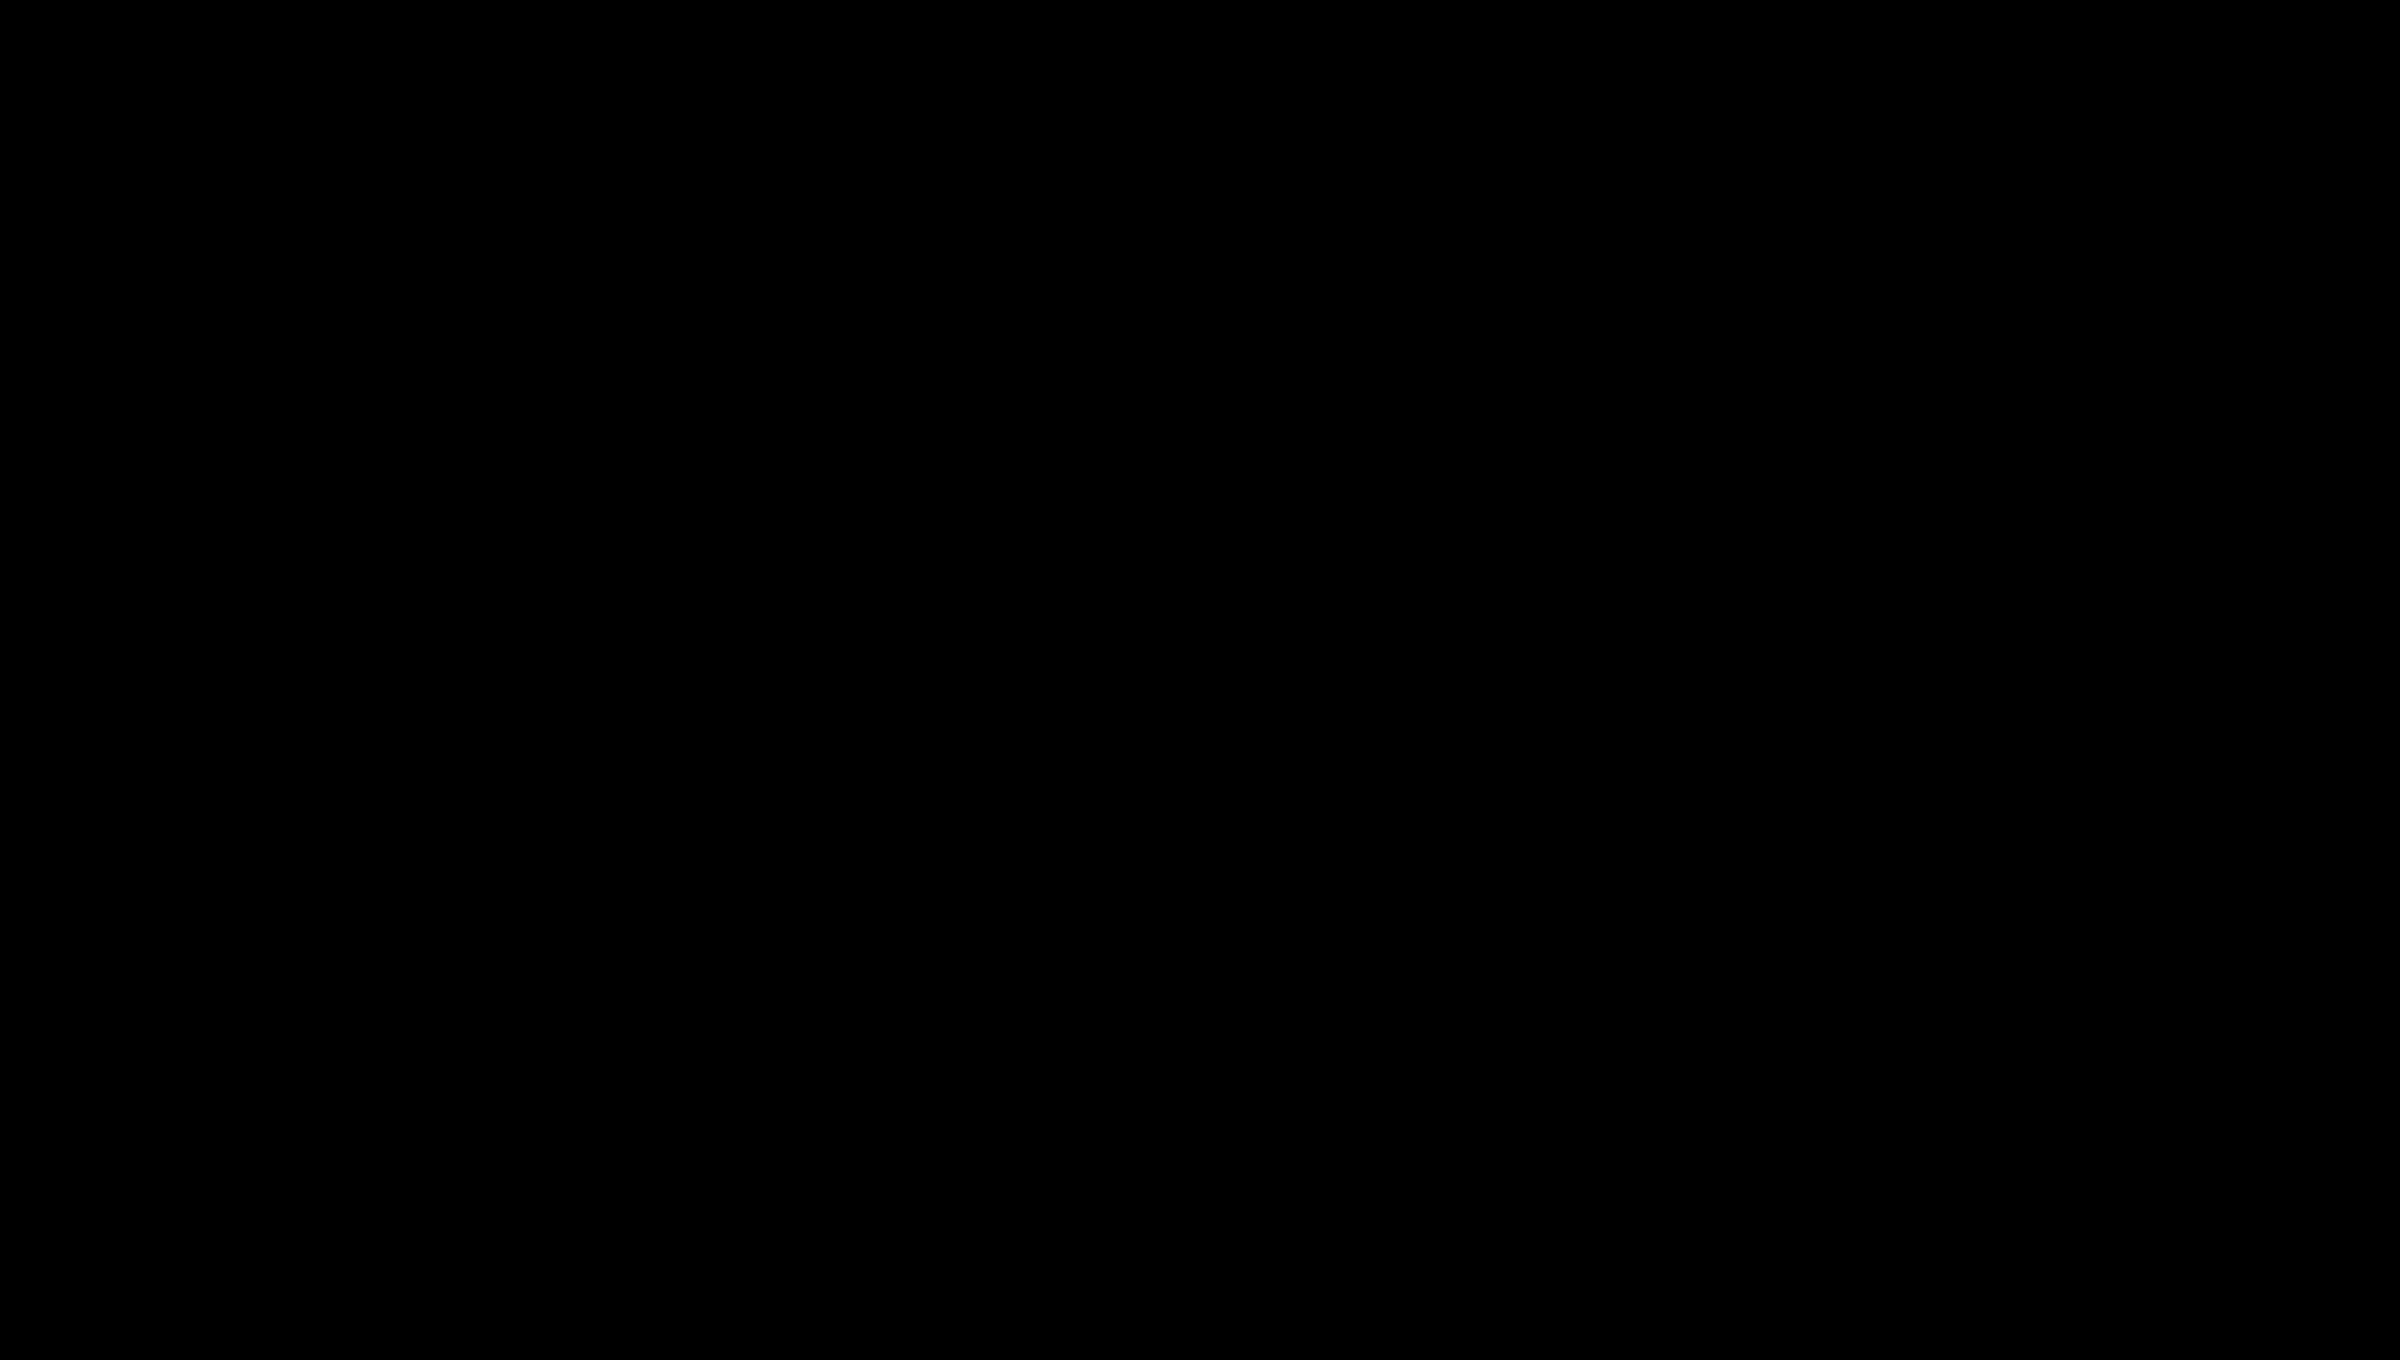 2400x1360 Kangaroo Silhouette Icons Png